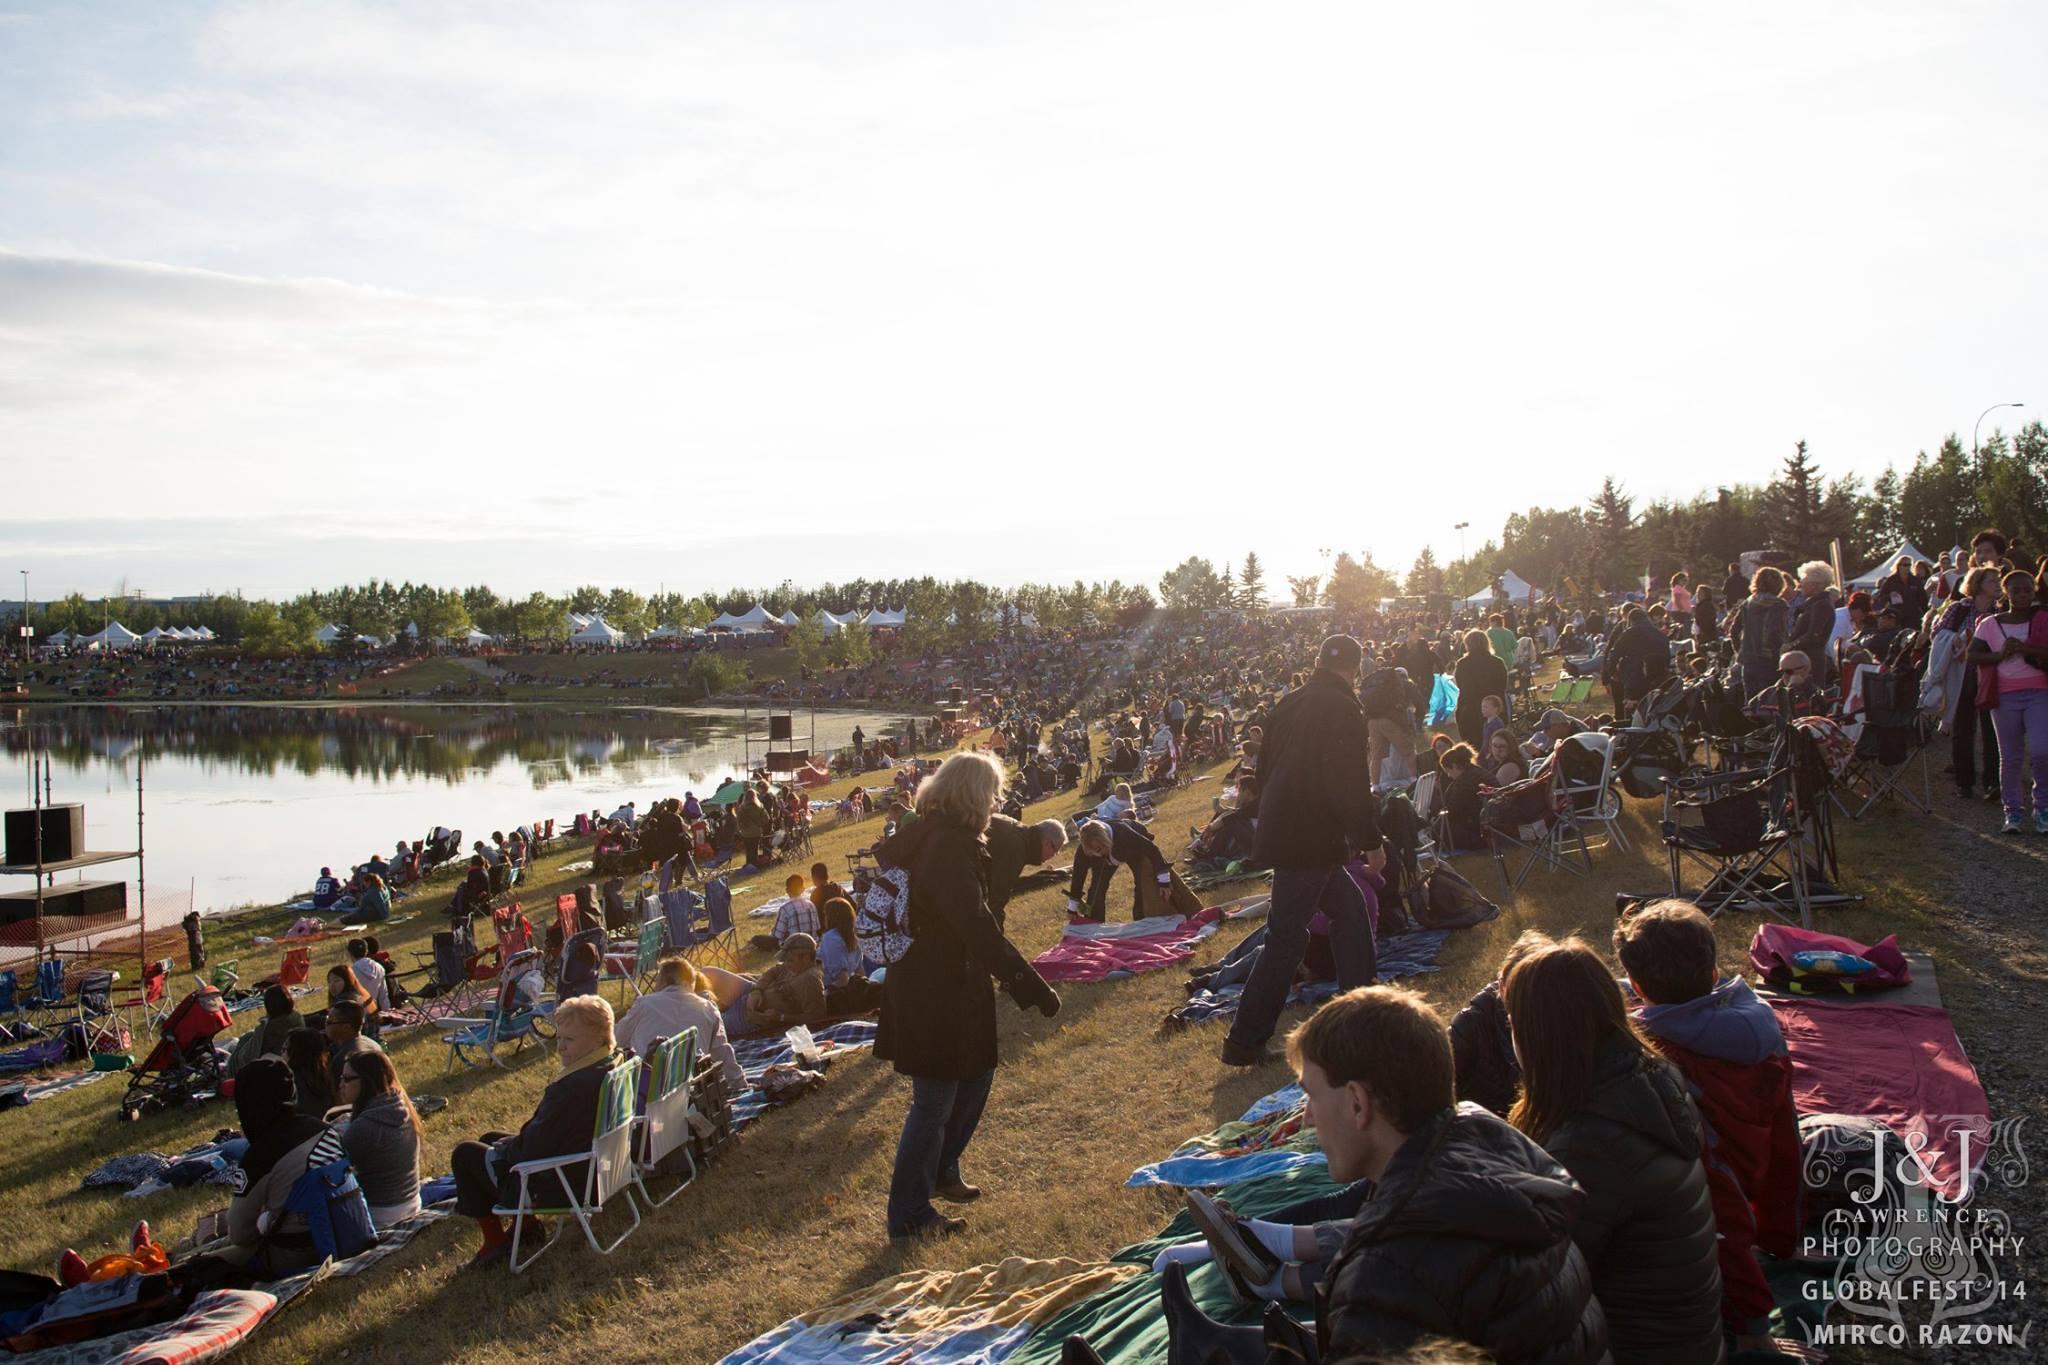 Image: GlobalFest - The Calgary Fireworks Festival Society/ Facebook